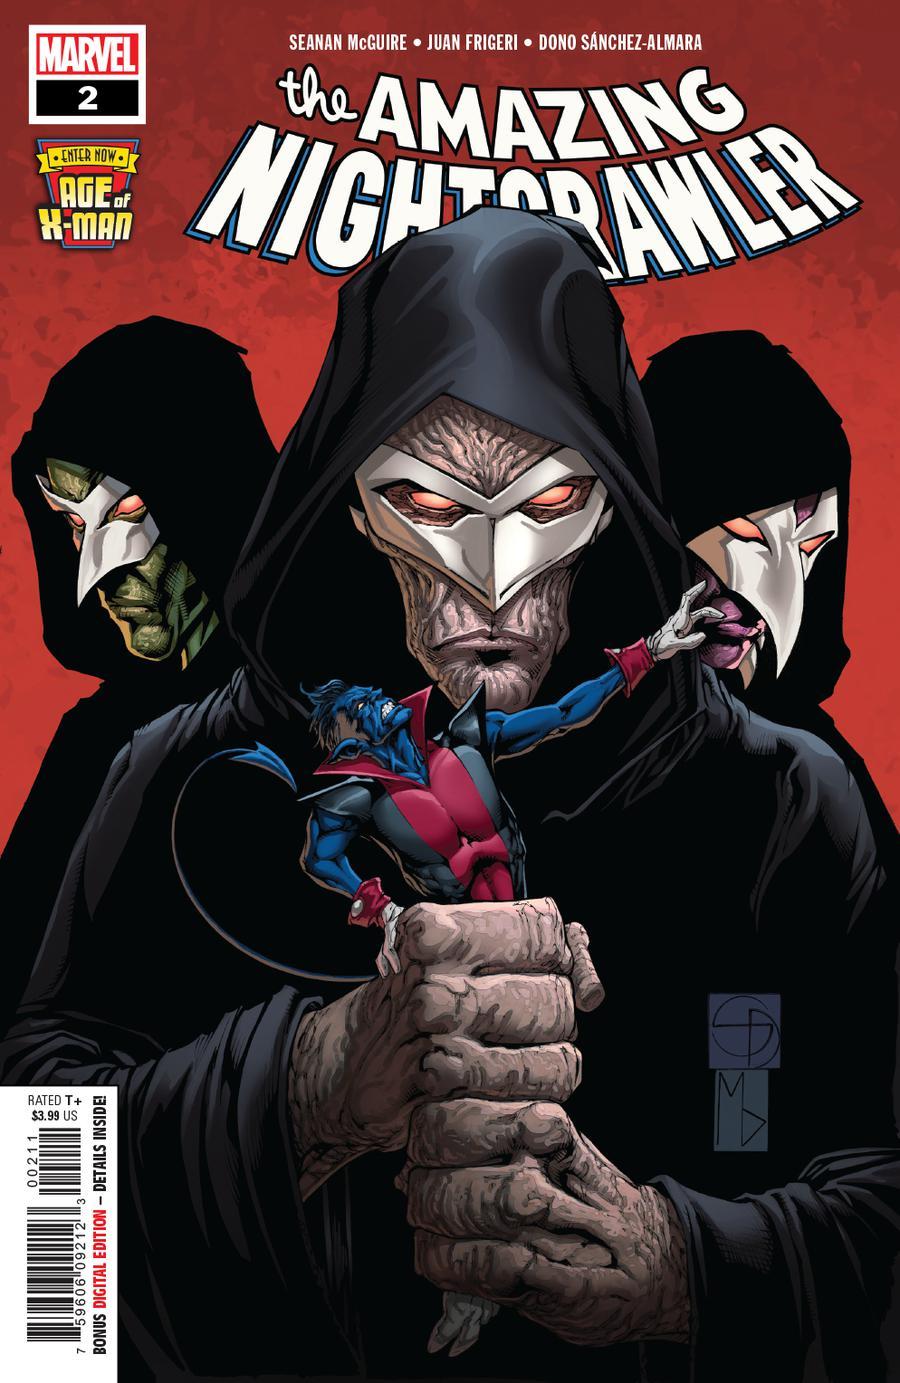 Age Of X-Man Amazing Nightcrawler #2 Cover A Regular Shane Davis Michelle Delecki & Frank DArmata Cover